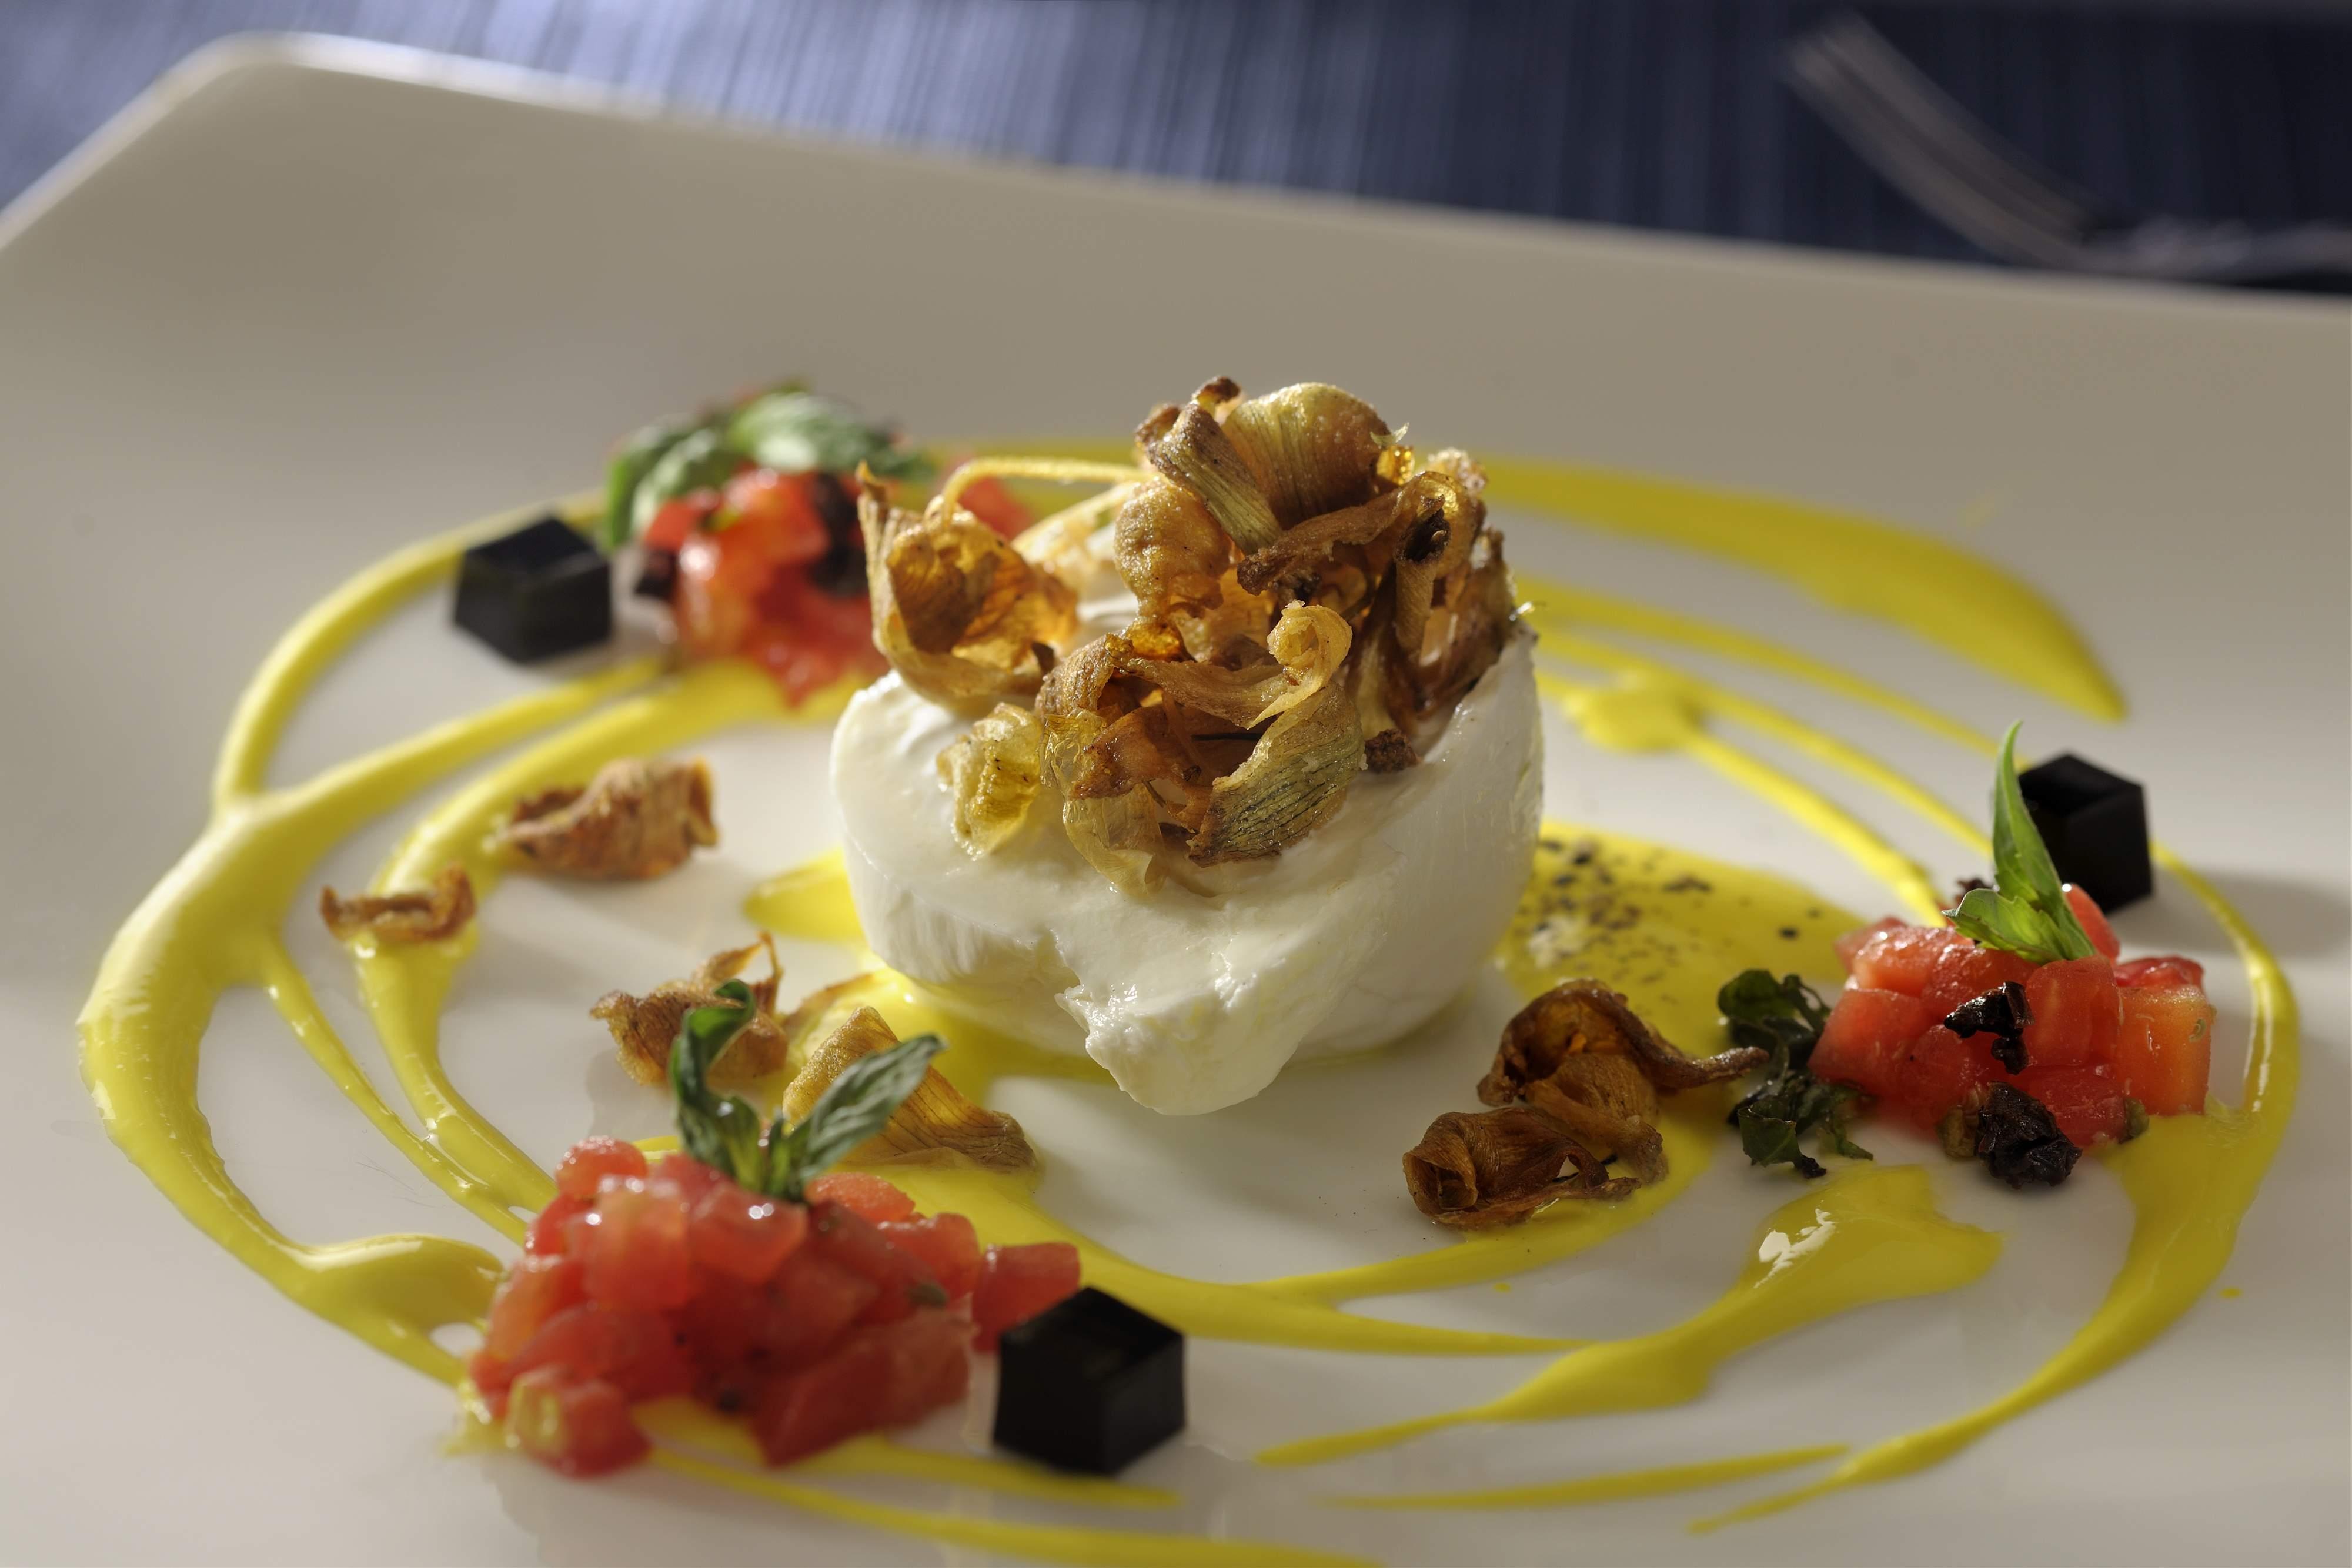 Monk-crafted Burrata, heirloom tomato tartare, creamed yellow squash, artichoke and basil essence